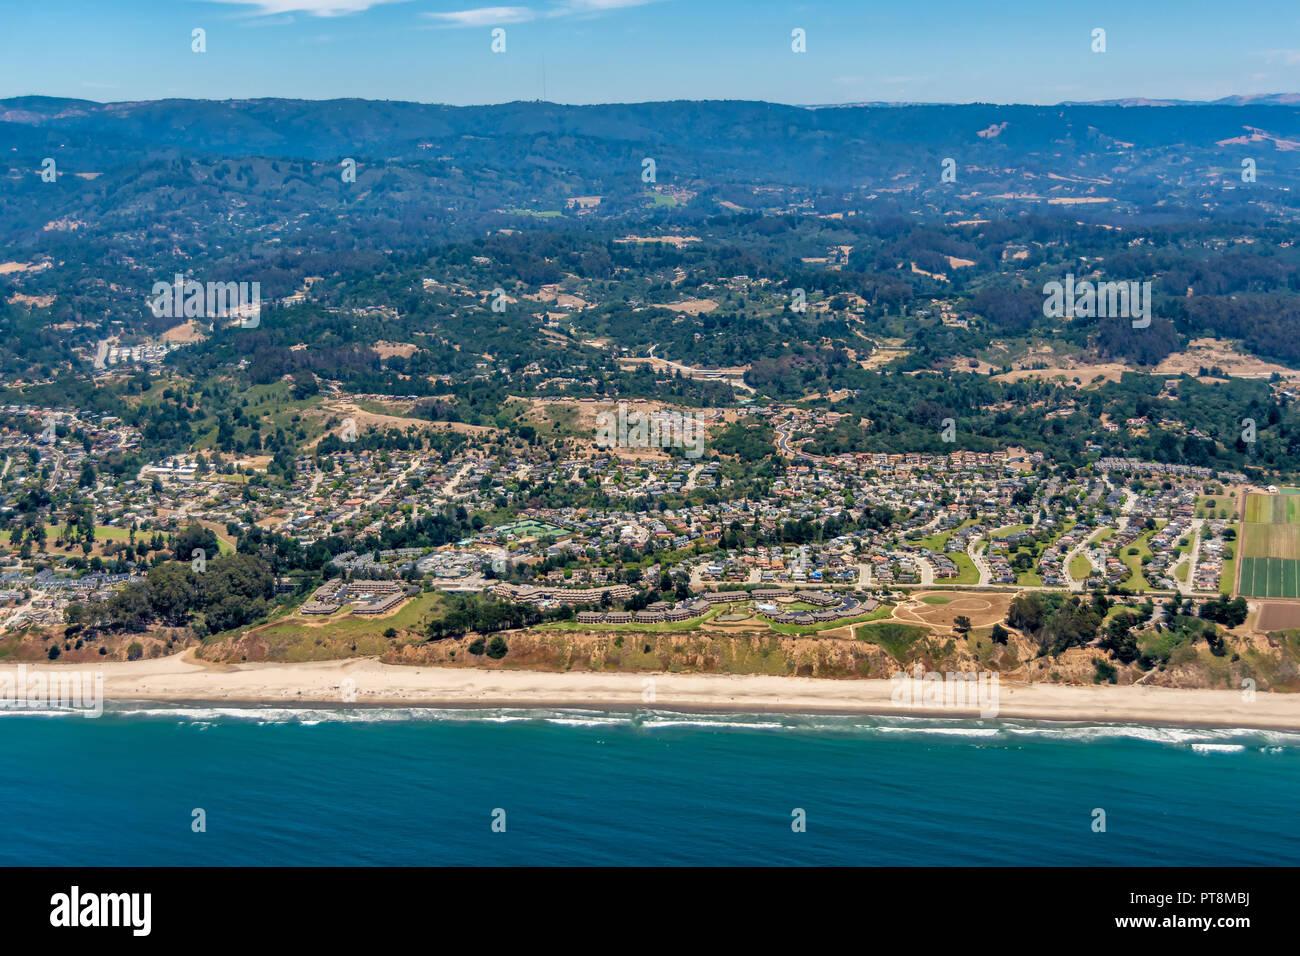 The aerial view of California coast with the city of Aptos, close to the city of Santa Cruz. - Stock Image